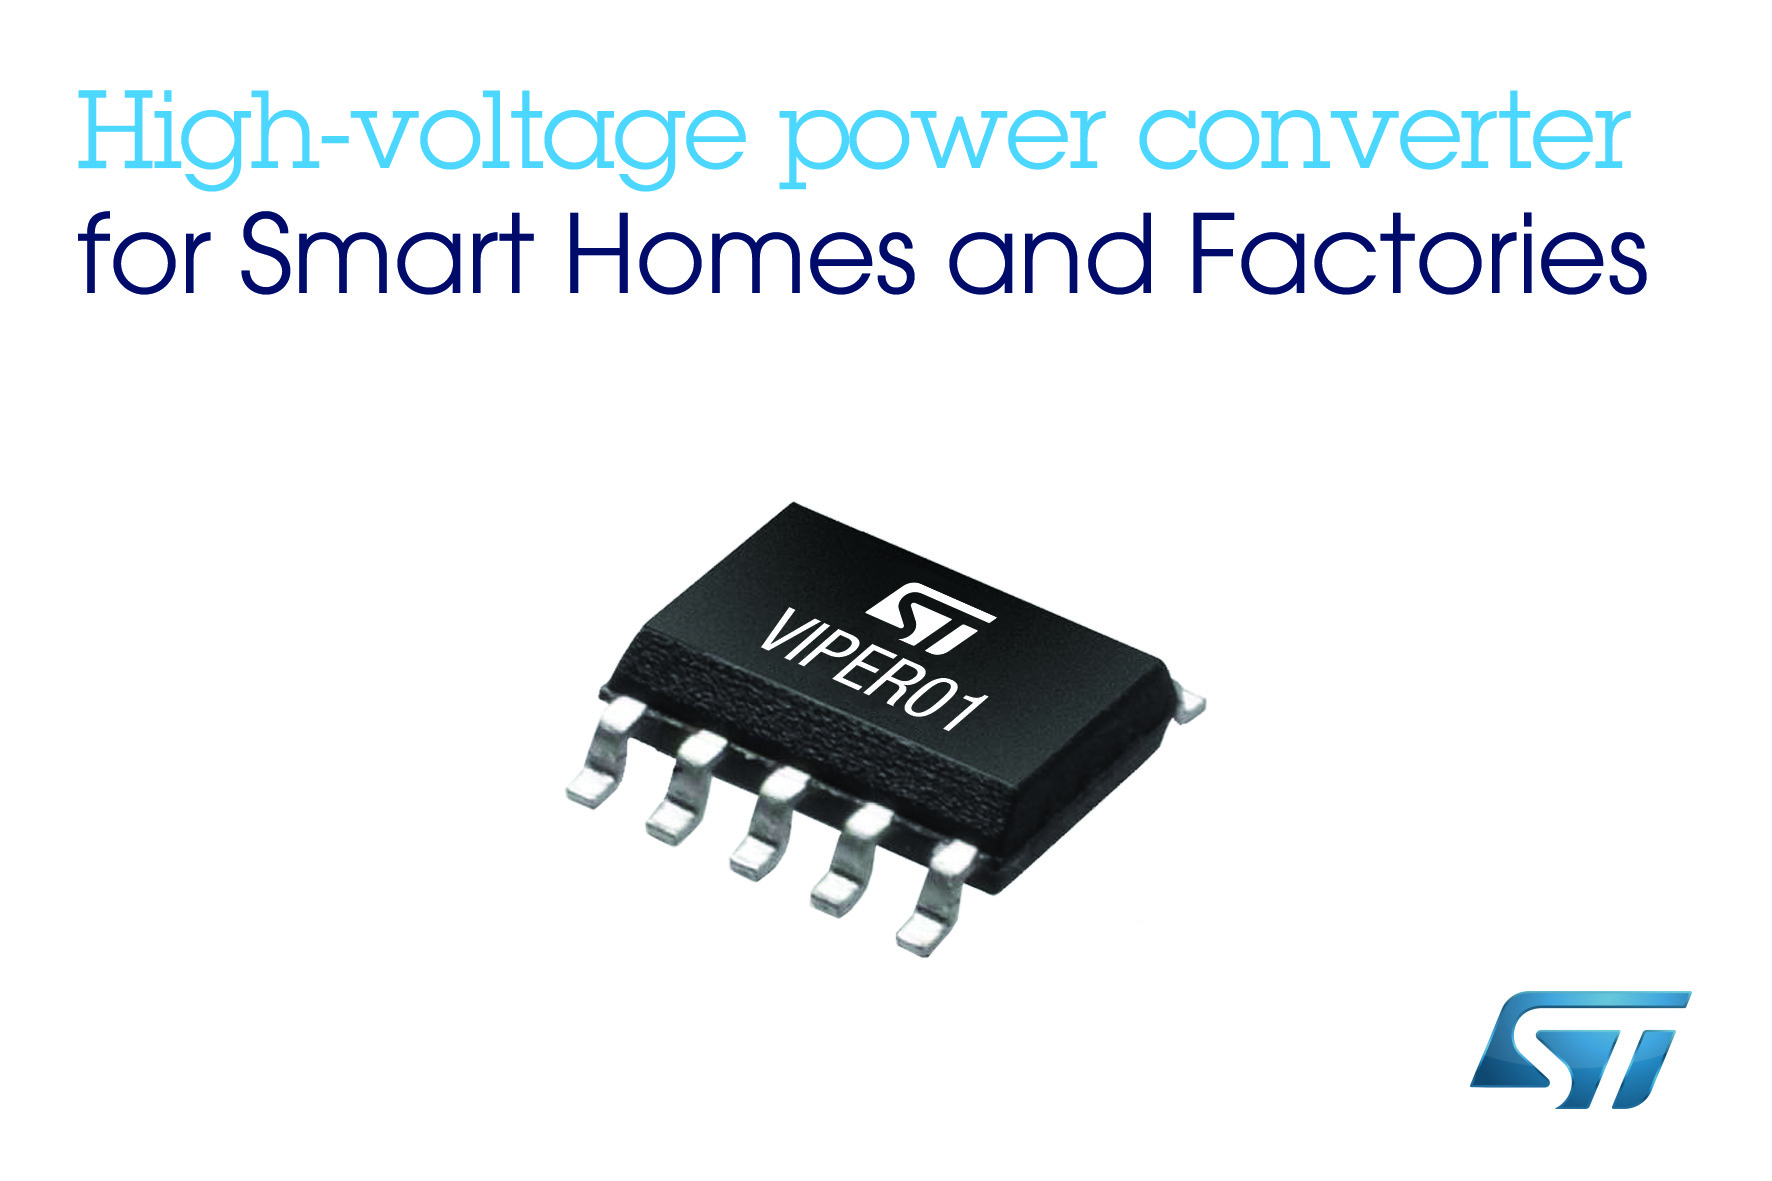 ST高压转换器让智能家居和工业用电源实现超低功耗